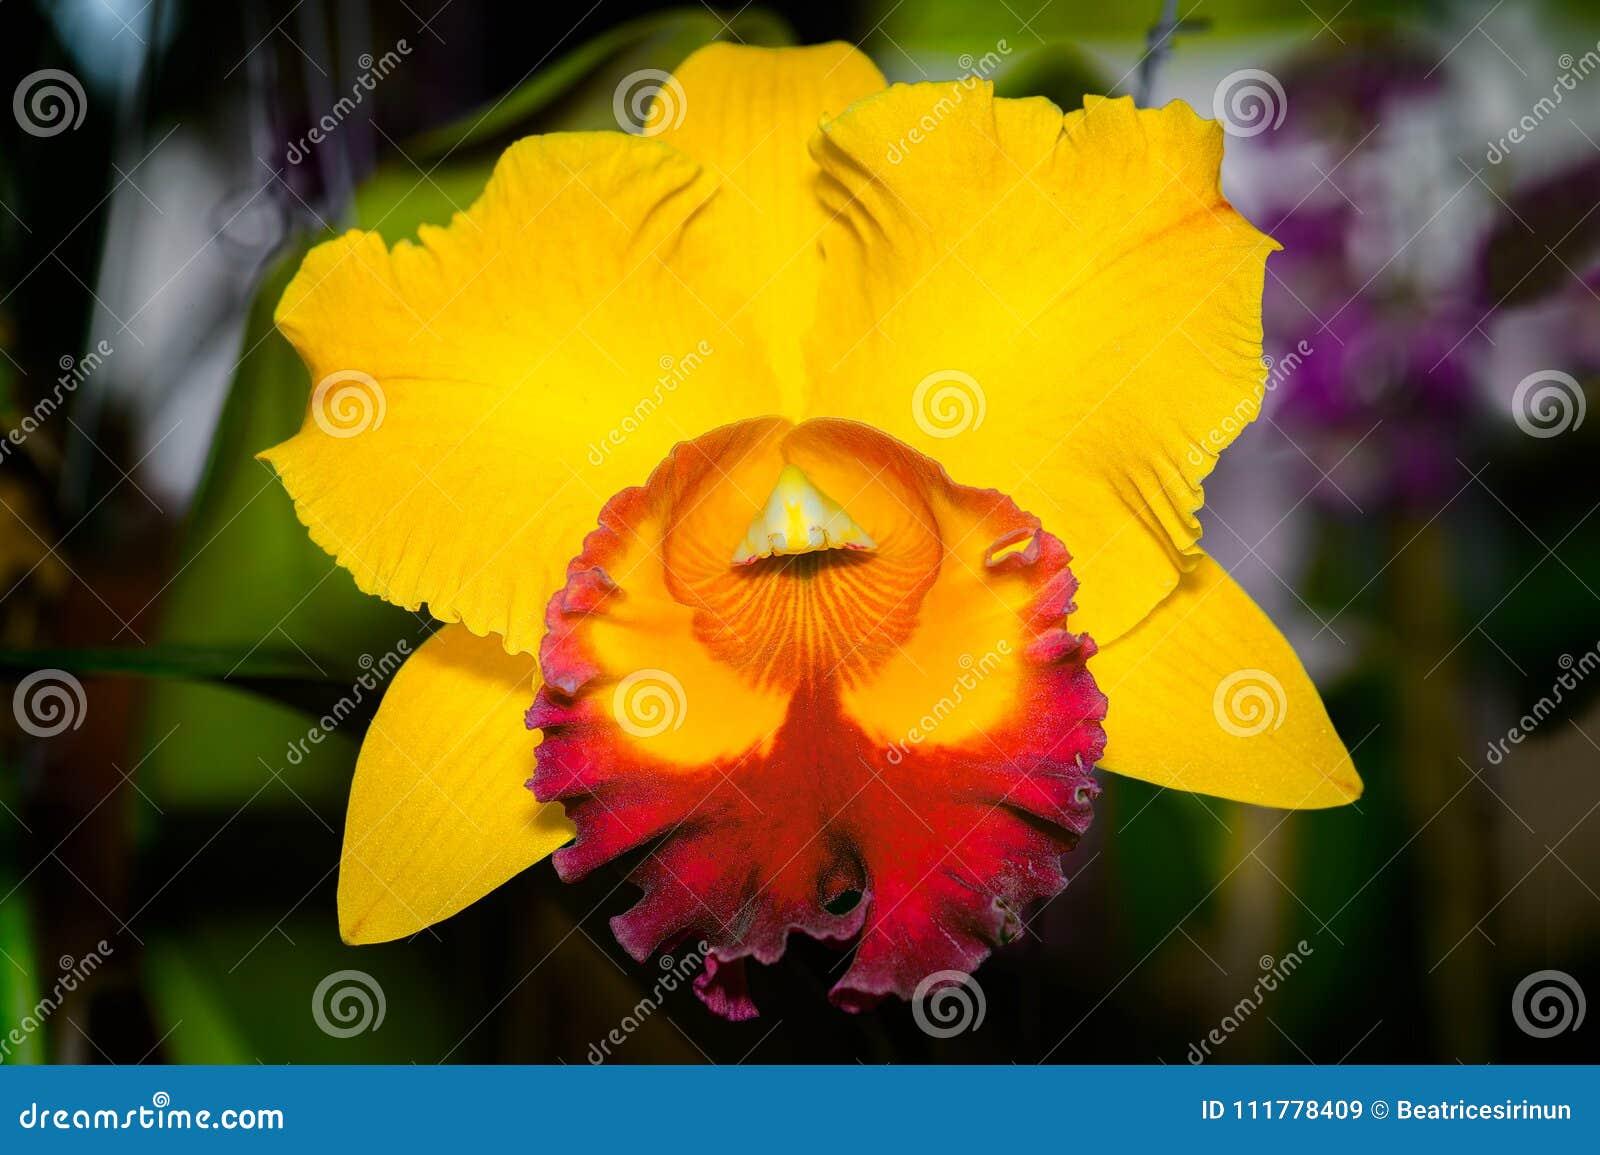 Cattleya Jomthong Delight Orchid